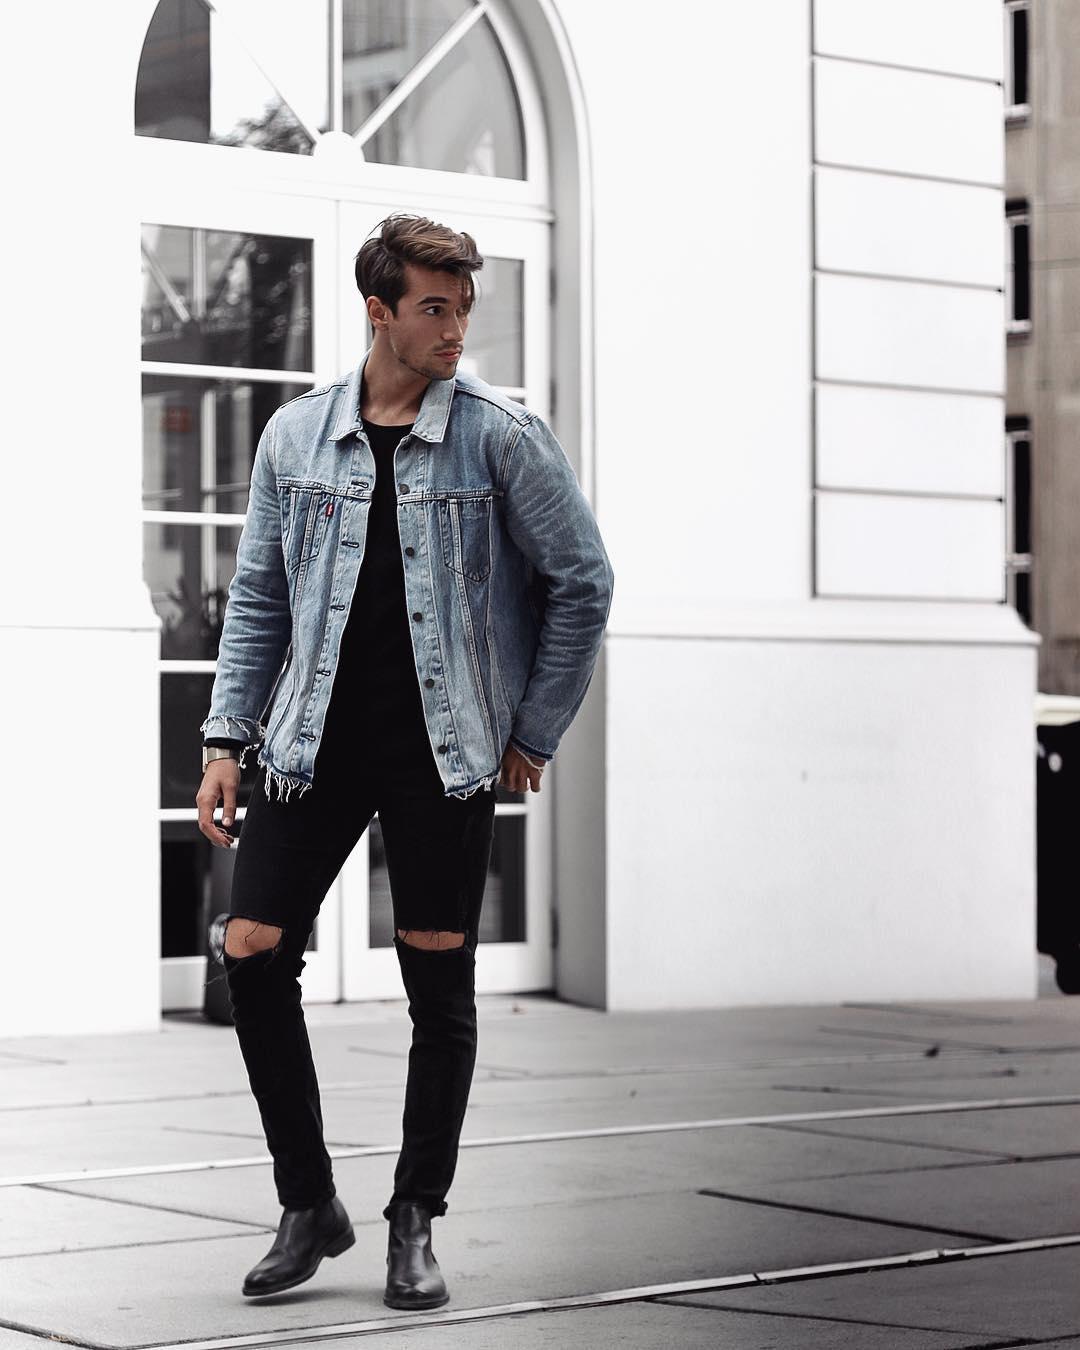 Jeans kleding leeftijd MAN MAN